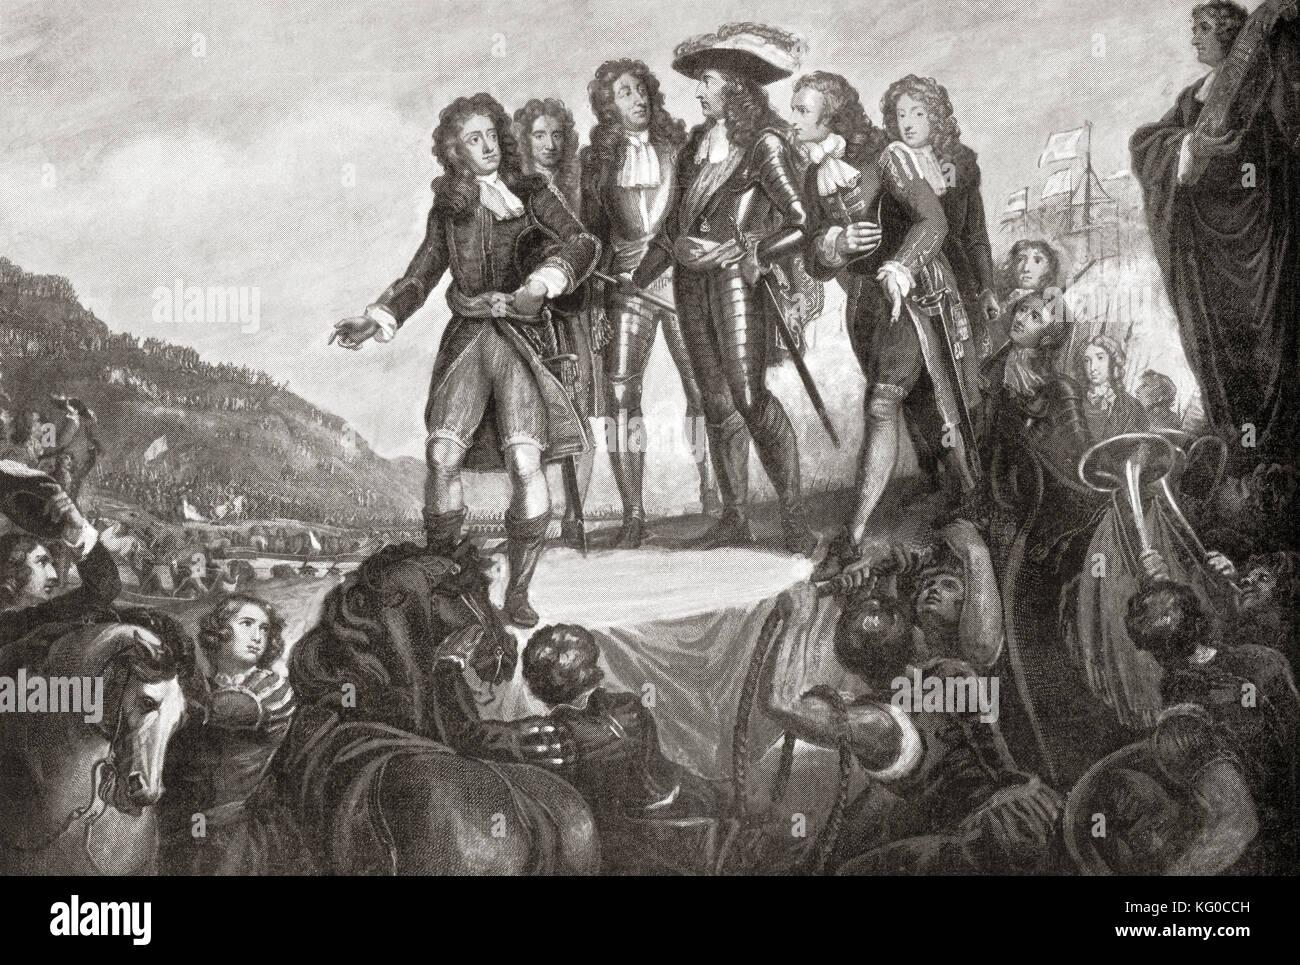 The landing of William of Orange in England in 1688. William III, 1650 to 1702. King of England and Ireland and, - Stock Image